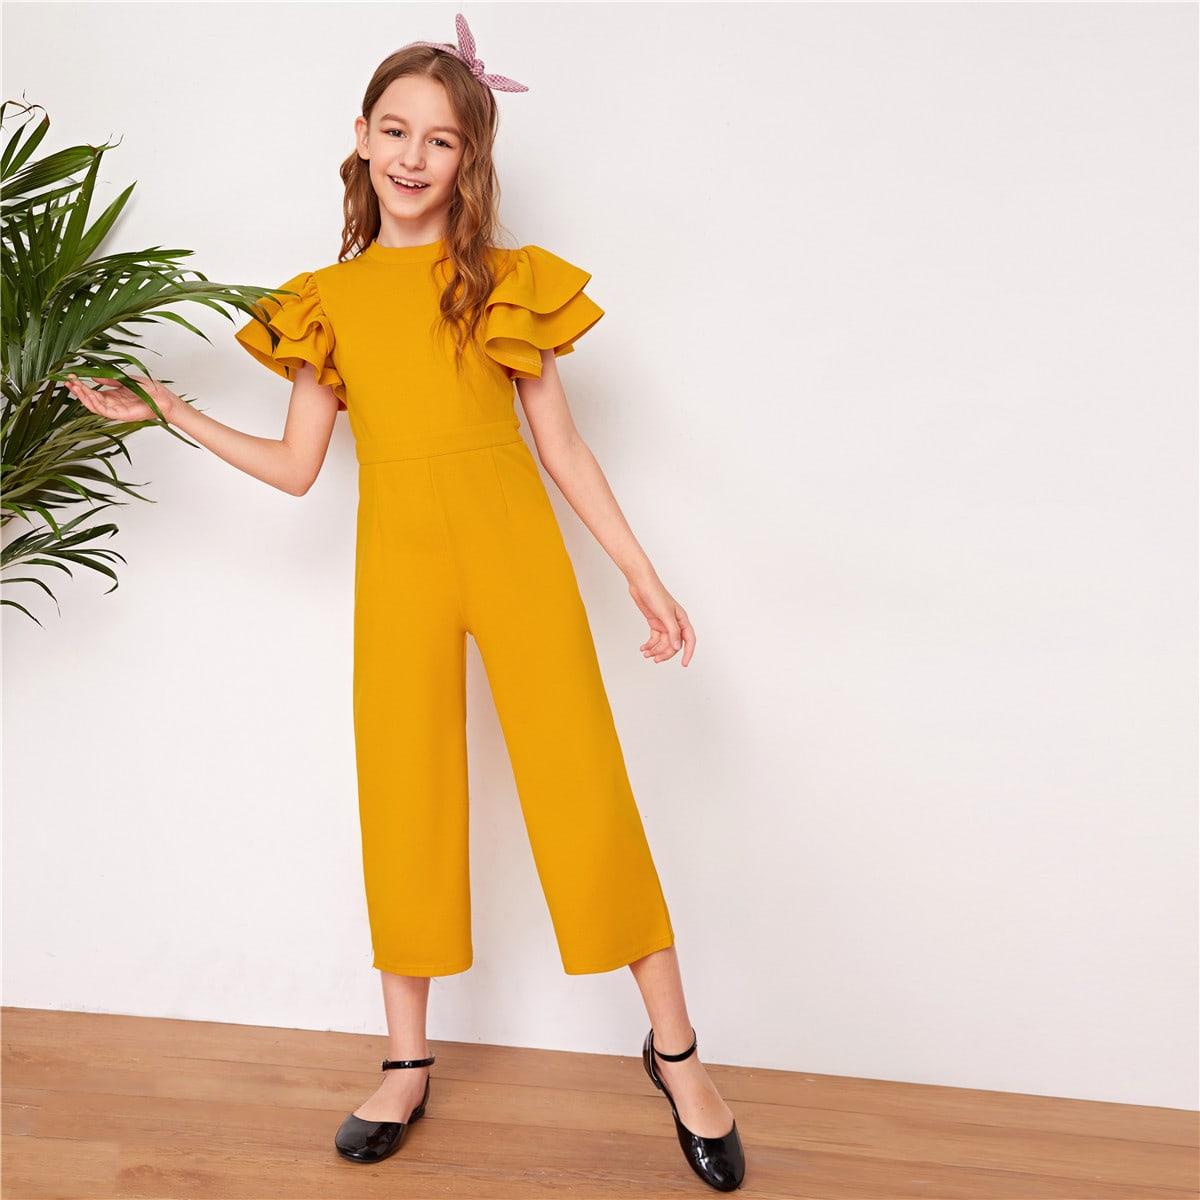 SHEIN / Girls Layered Flutter Sleeve Solid Jumpsuit